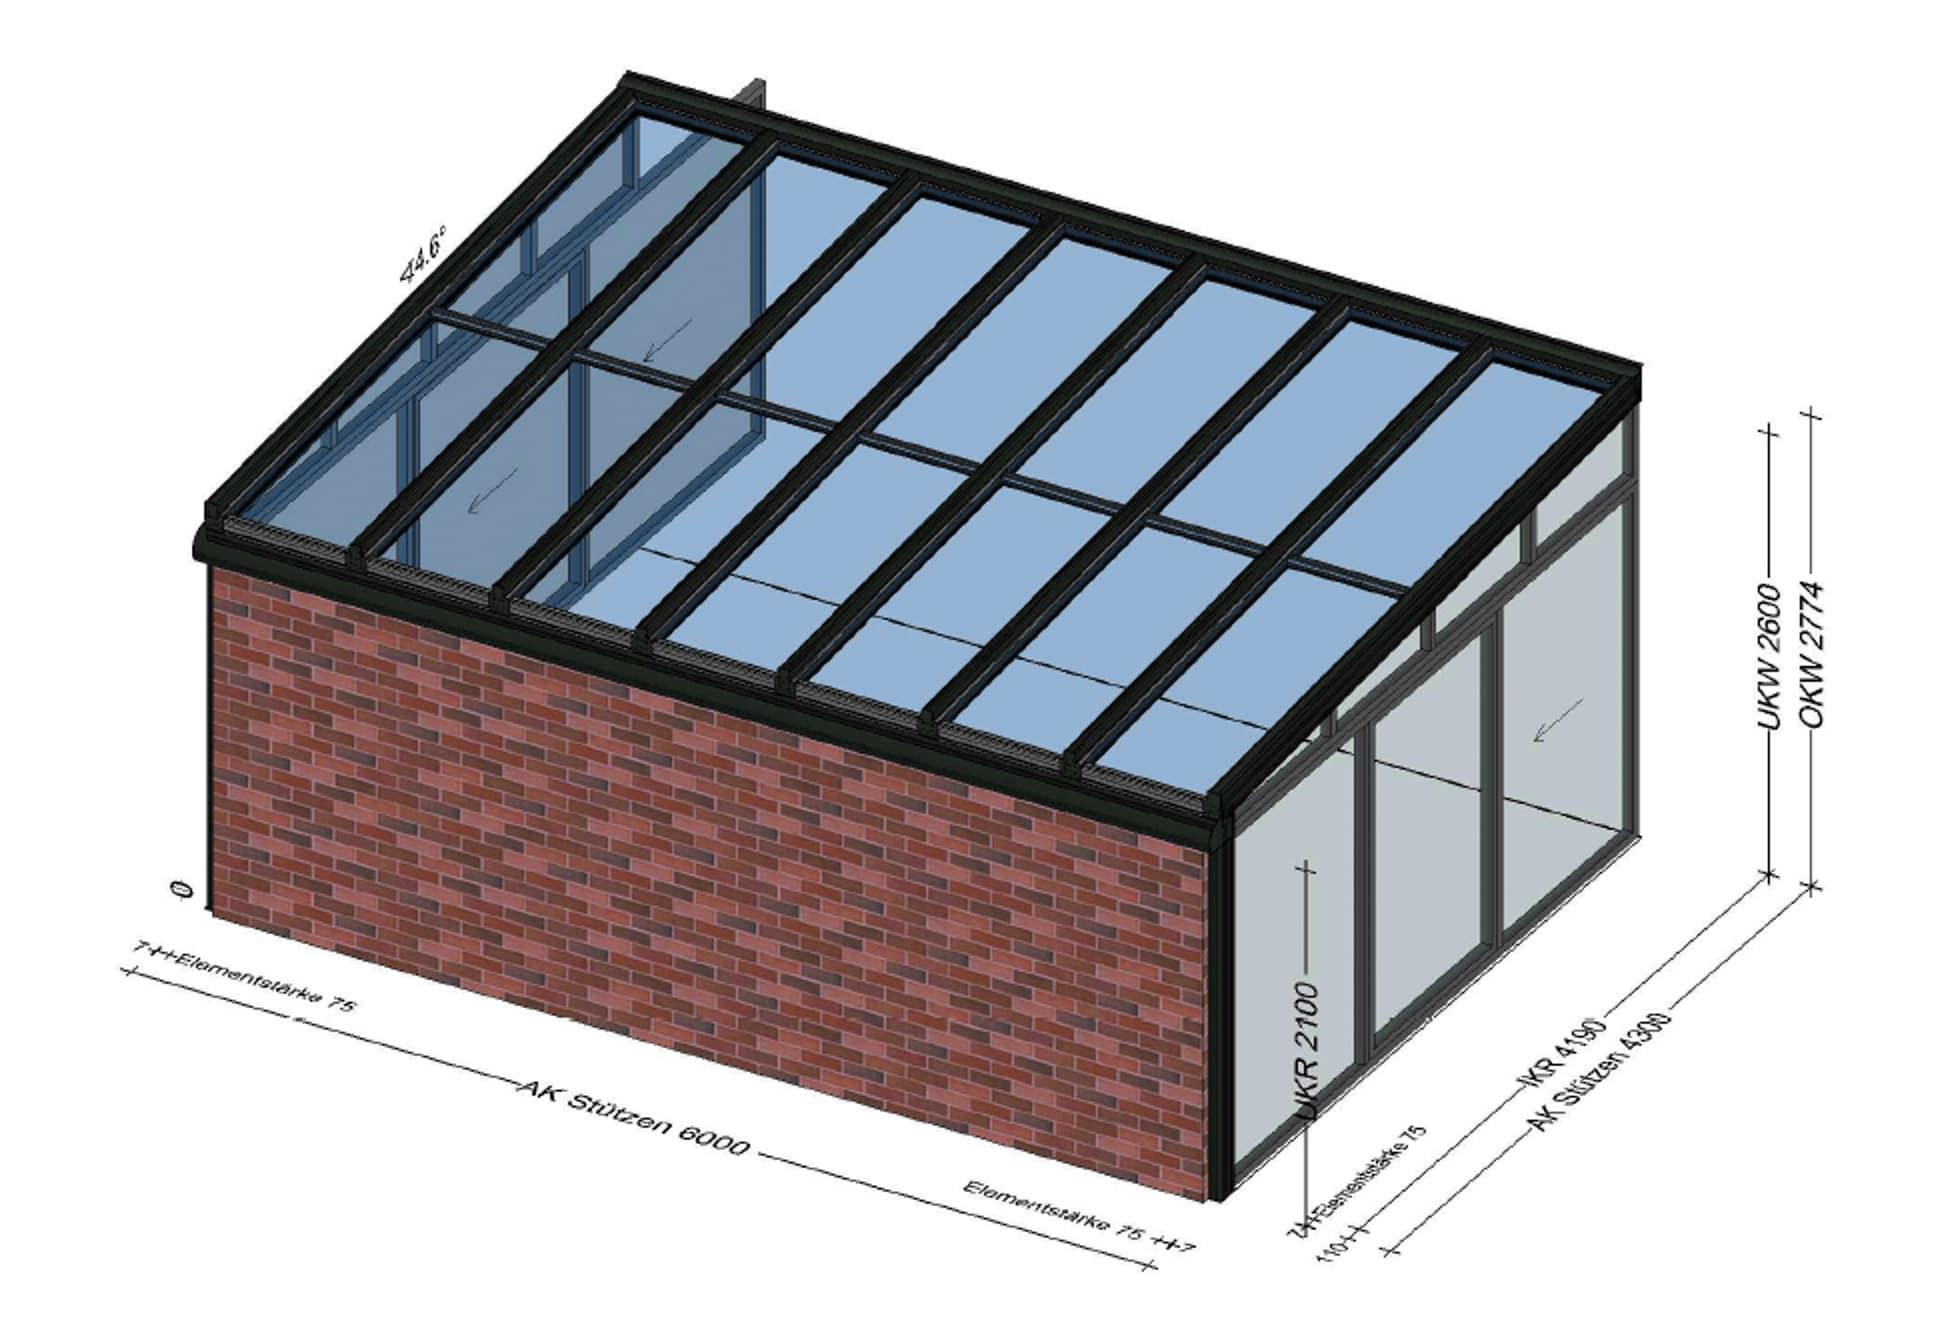 Wintergarten Planung als Poolhaus